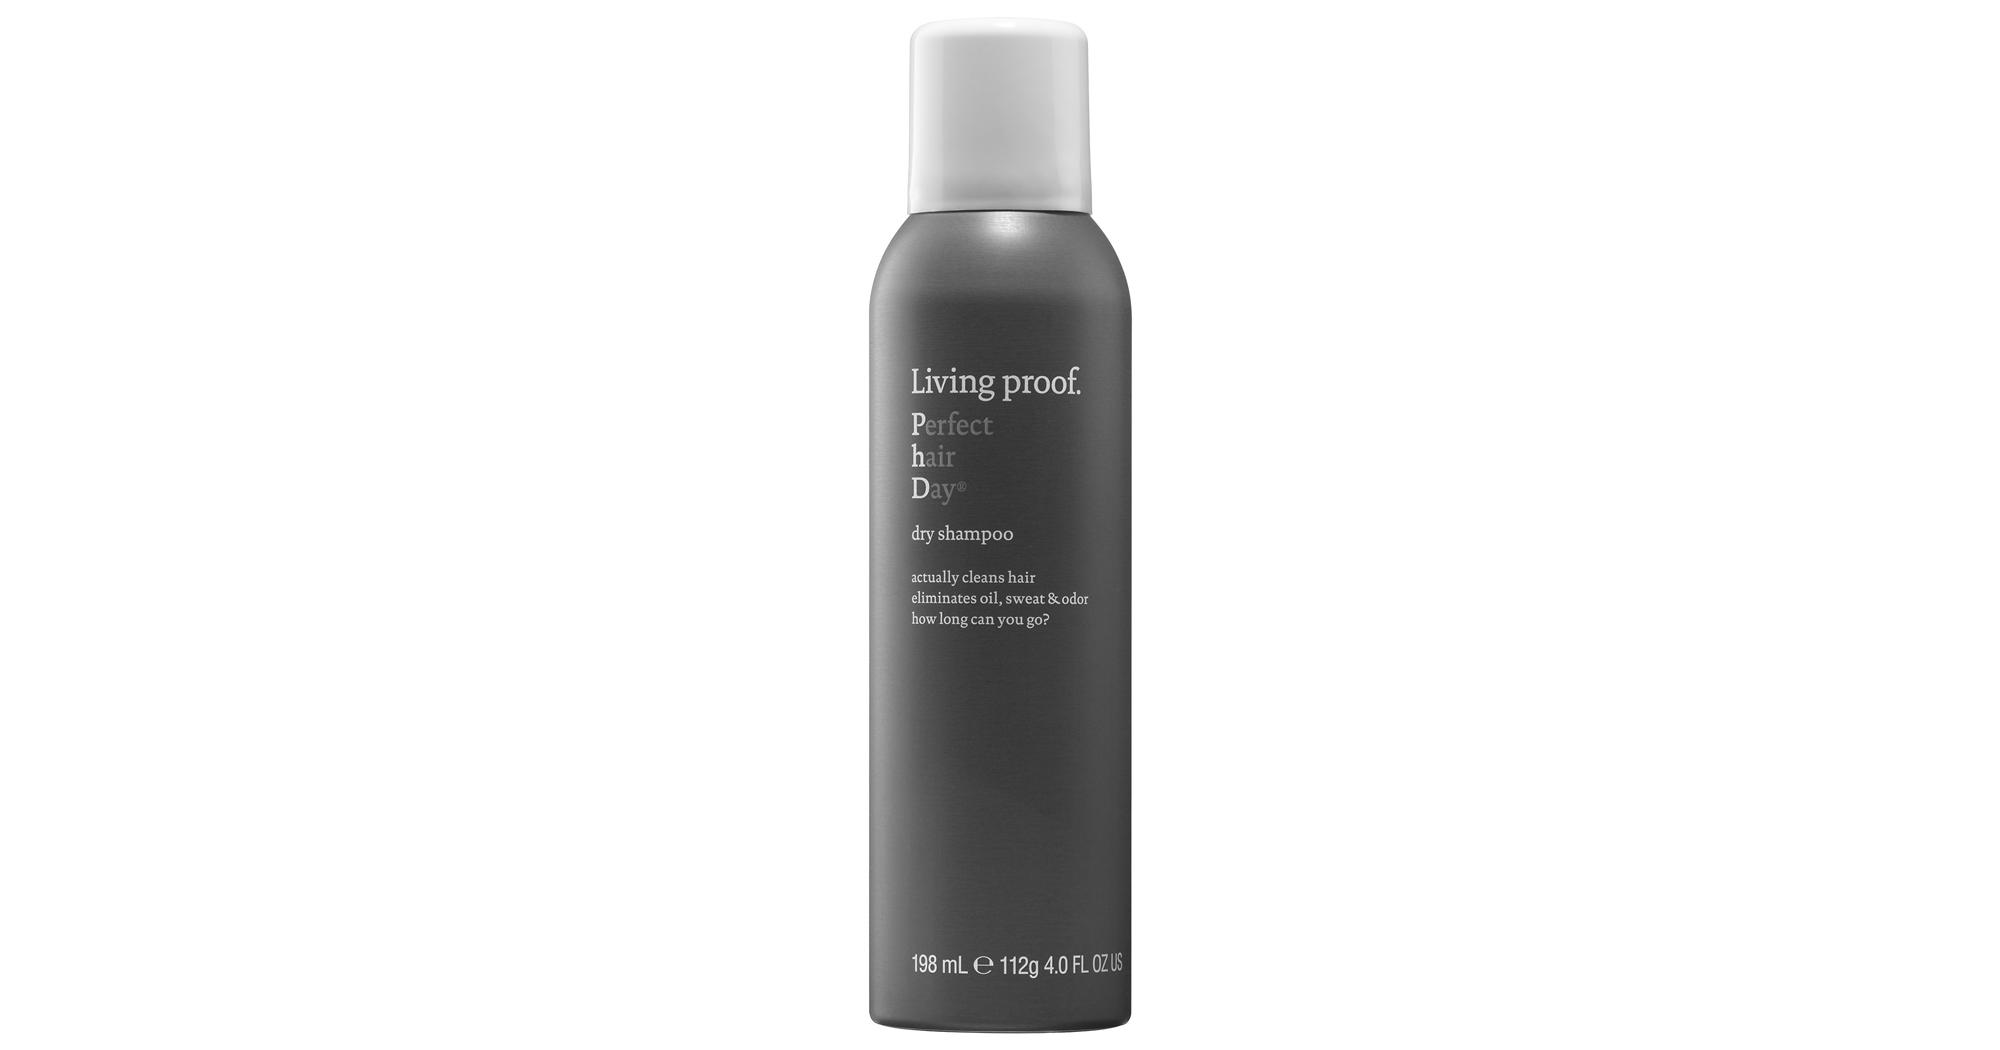 Klorane Dry Shampoo Living Proof Dry Shampoo Best Sellers